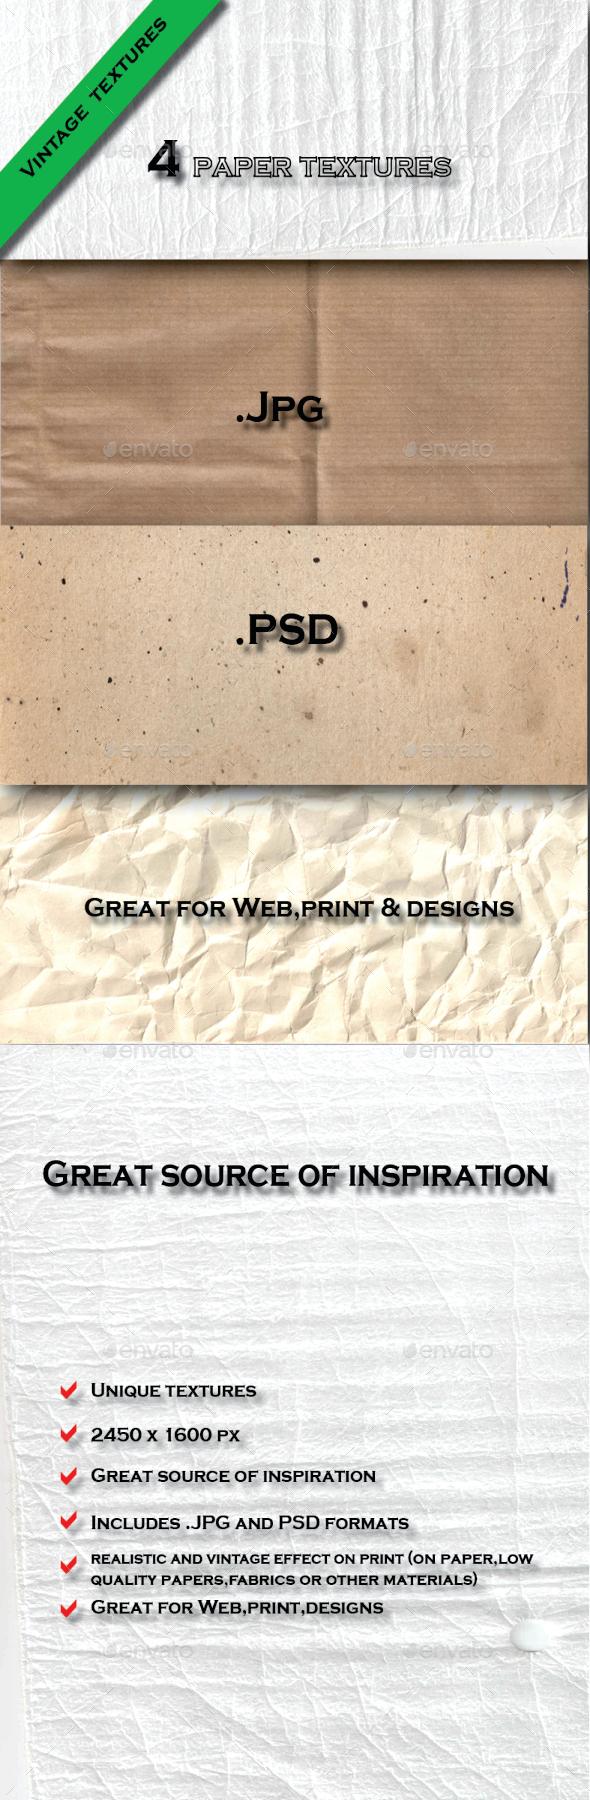 4 Vintage Paper Textures Pack - Paper Textures